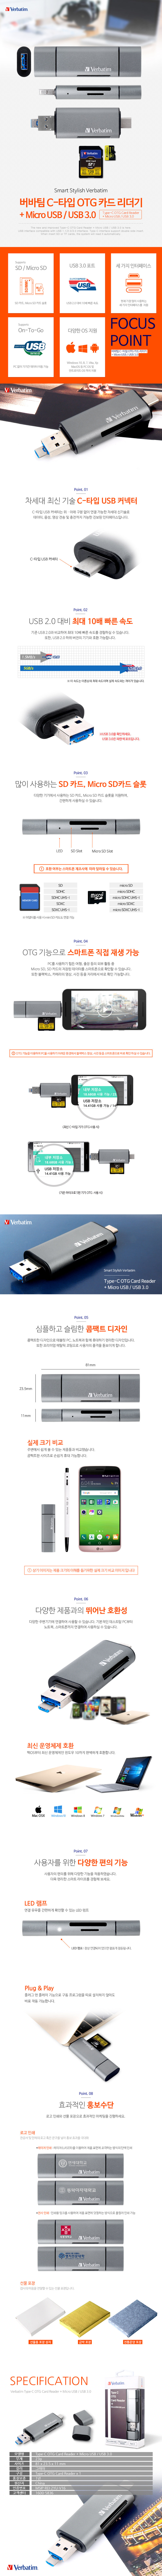 C타입 OTG 카드리더기+마이크로5핀 USB3.0 - 버바팀, 22,000원, USB제품, USB 메모리 카드리더기